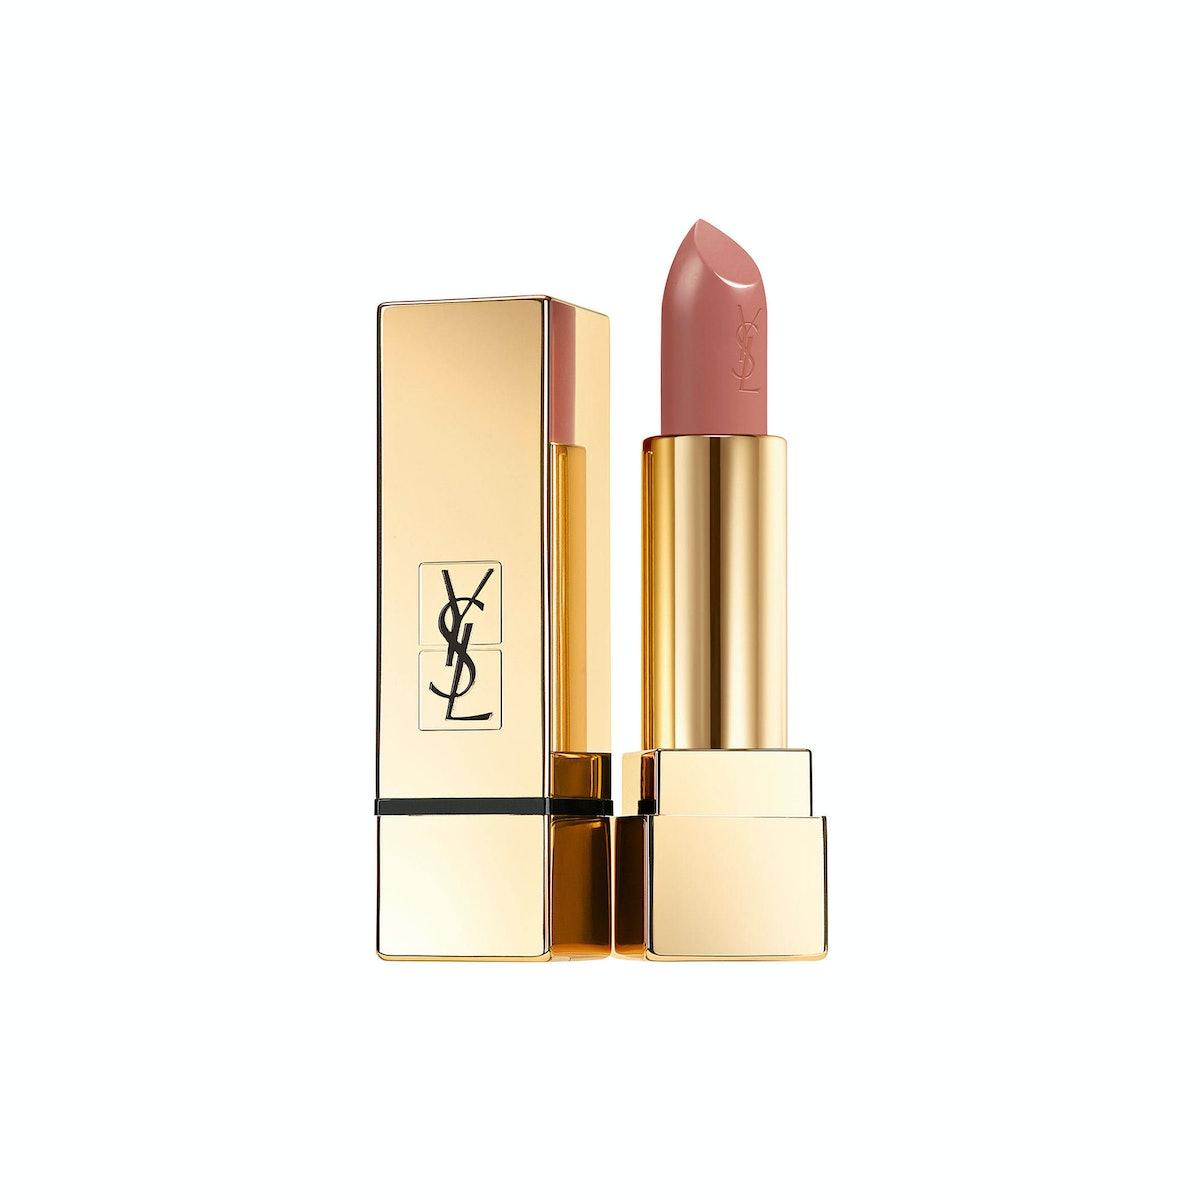 Yves-Saint-Laurent-lipstick